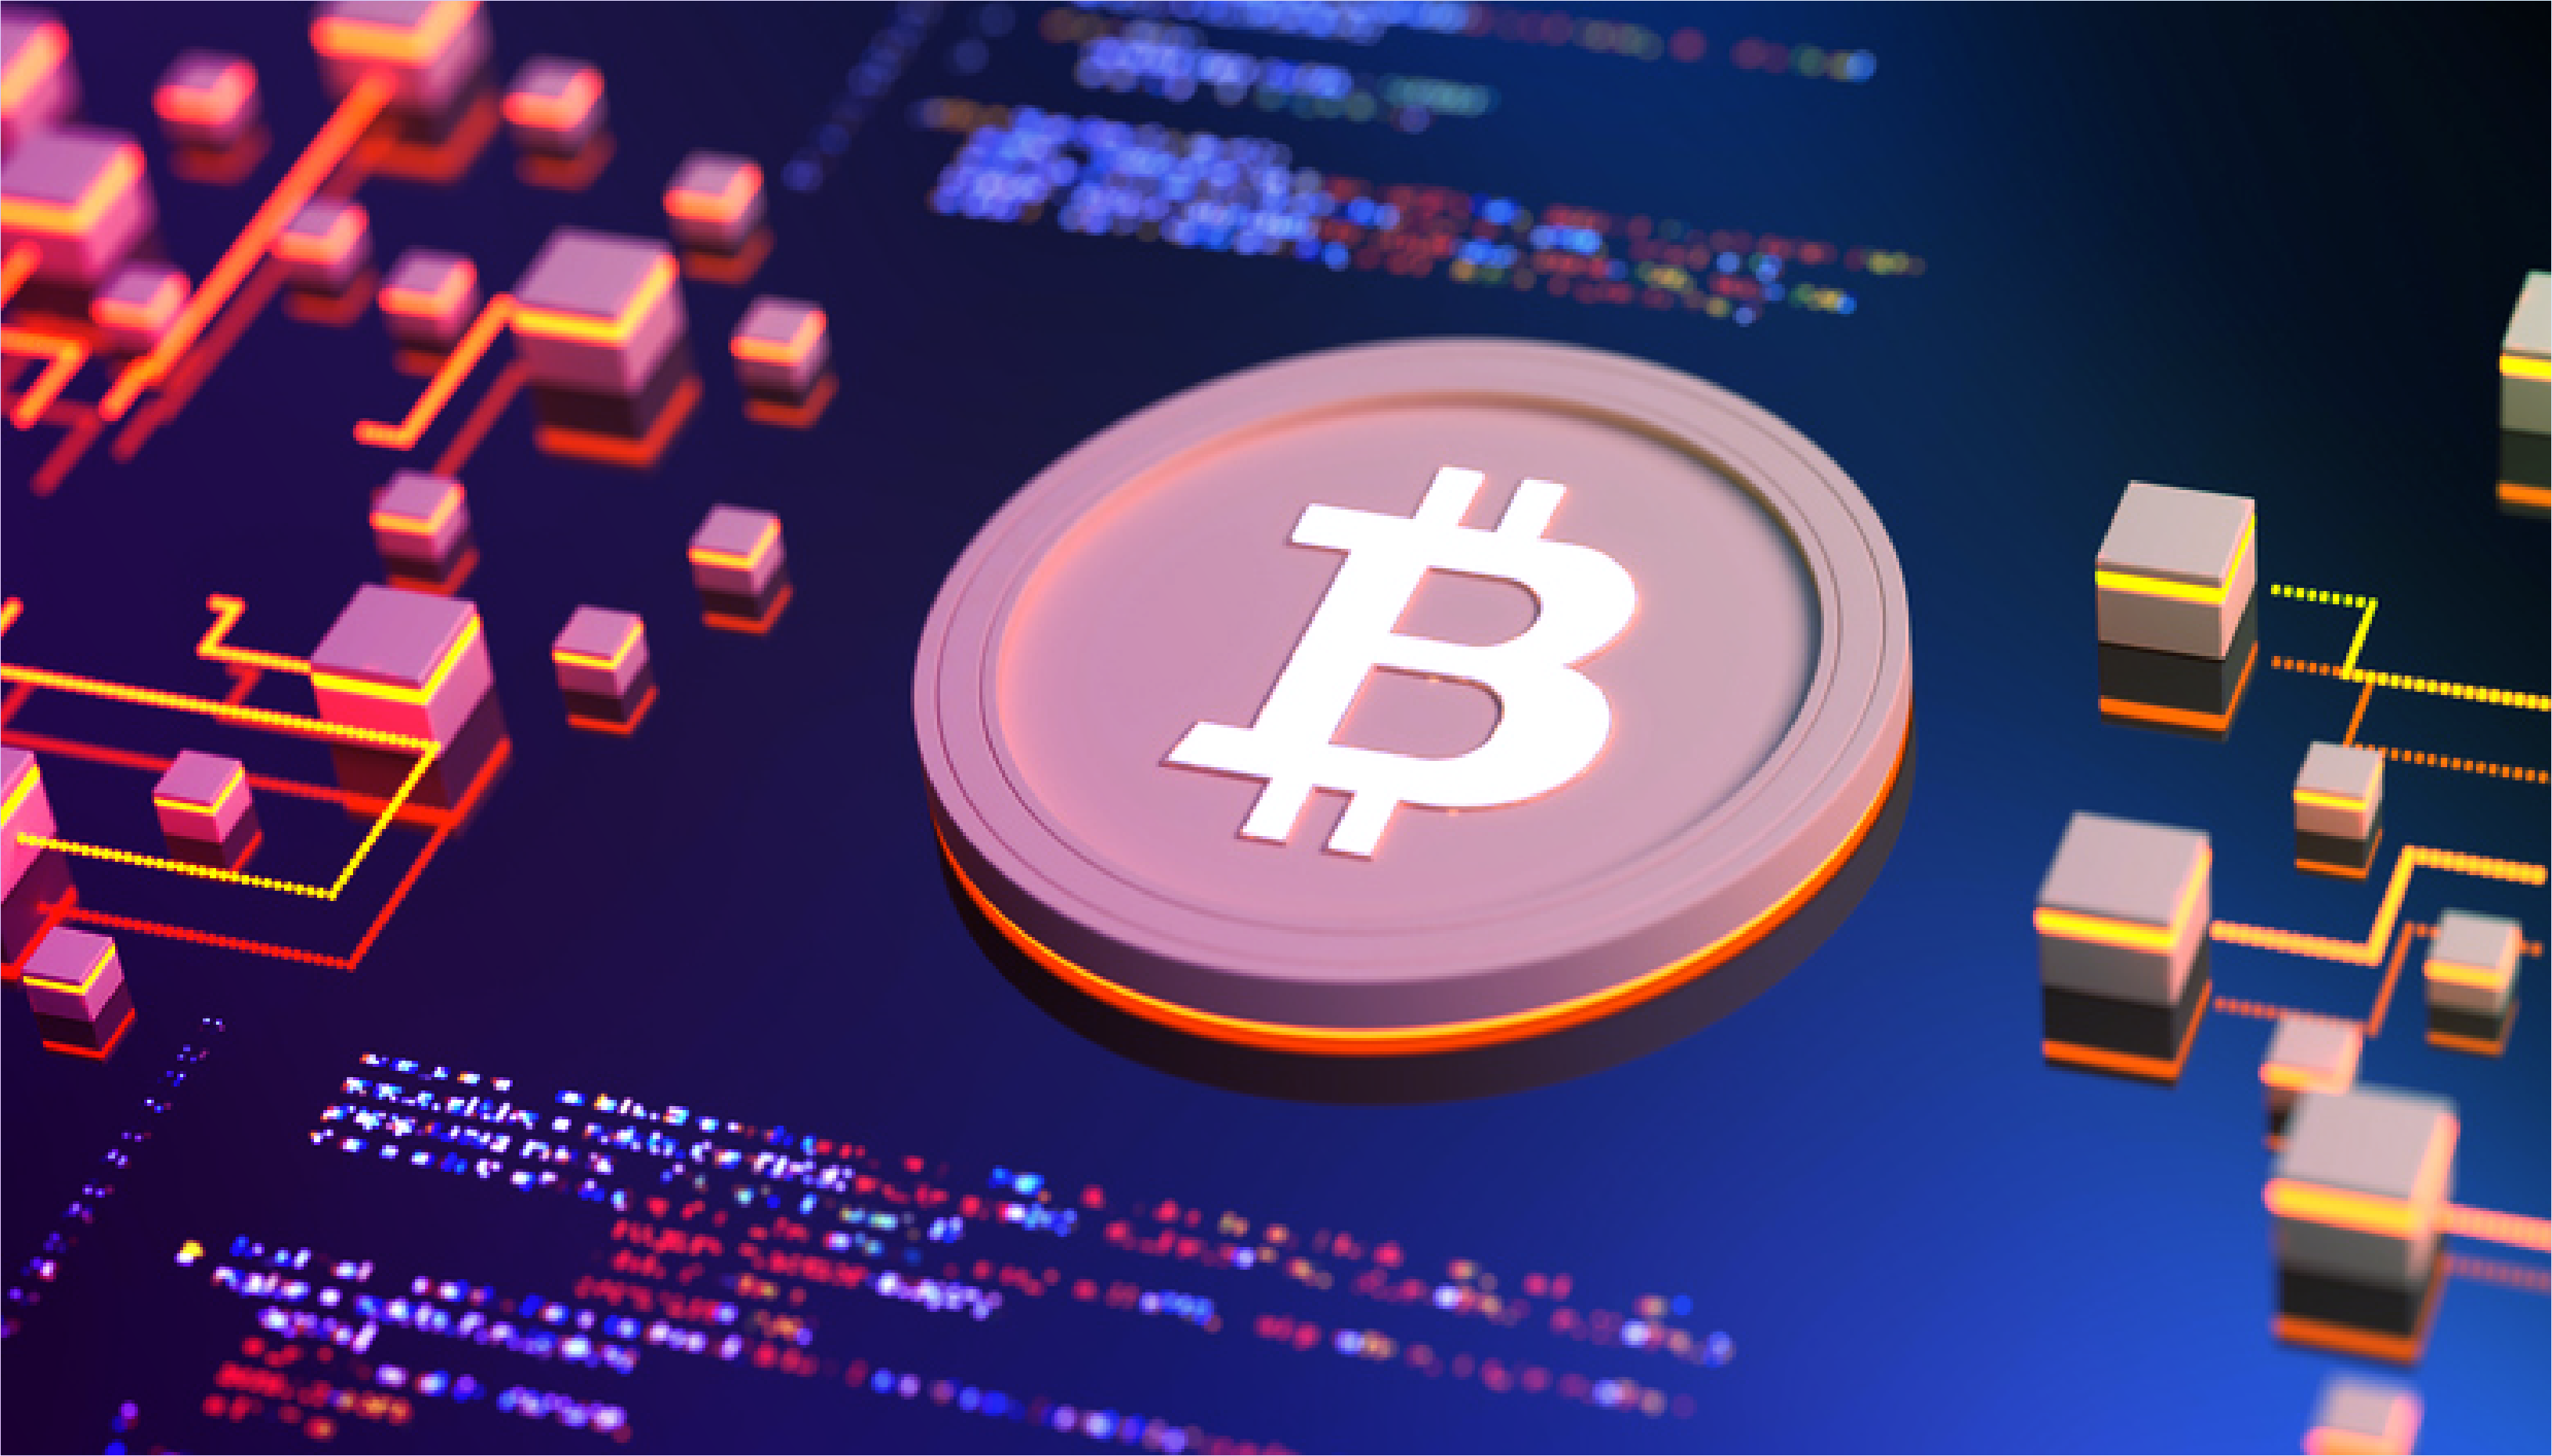 Image of bitcoin breaking through a dollar bill